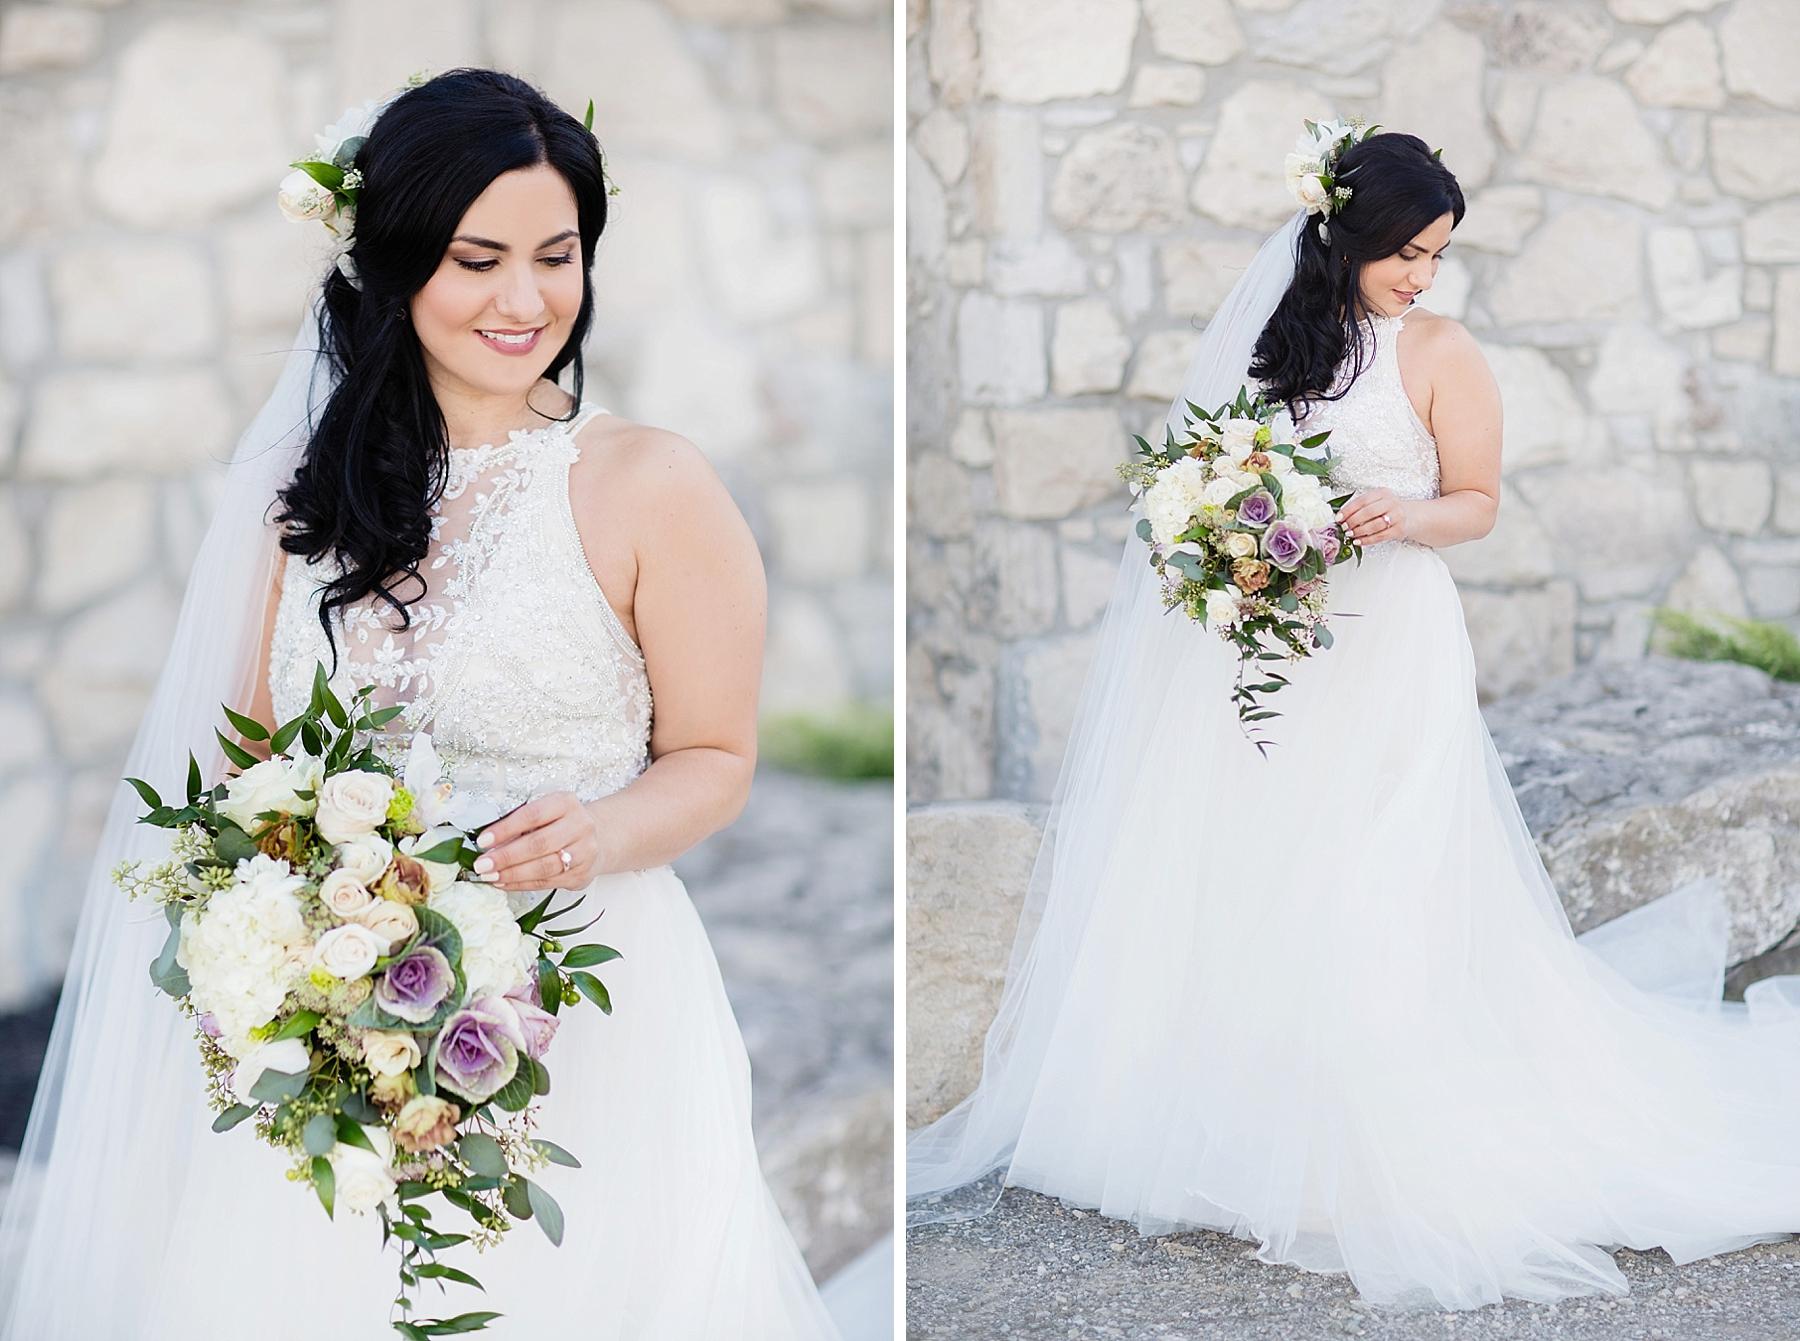 windsor-wedding-photographer-sprucewood-shores-winery-wedding-niagara-on-the-lake-wedding-photographer-eryn-shea-photography_0031.jpg